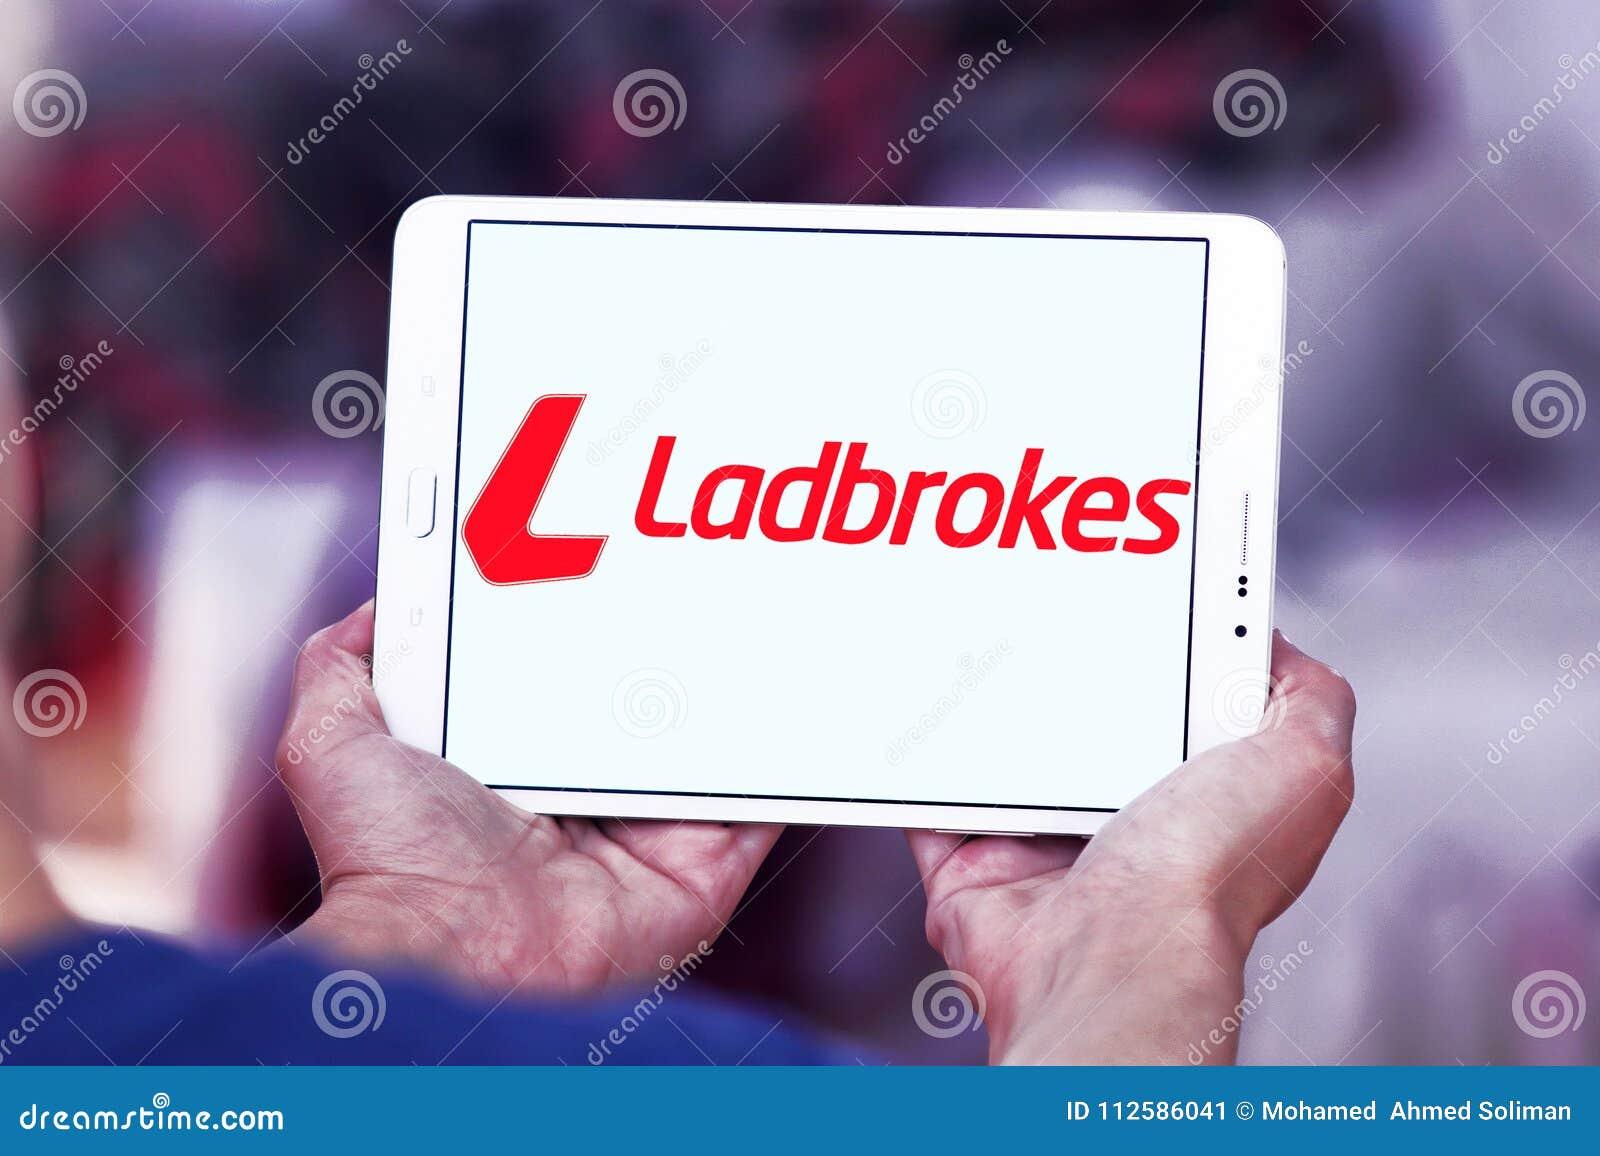 Ladbrokes company logo editorial photo  Image of icon